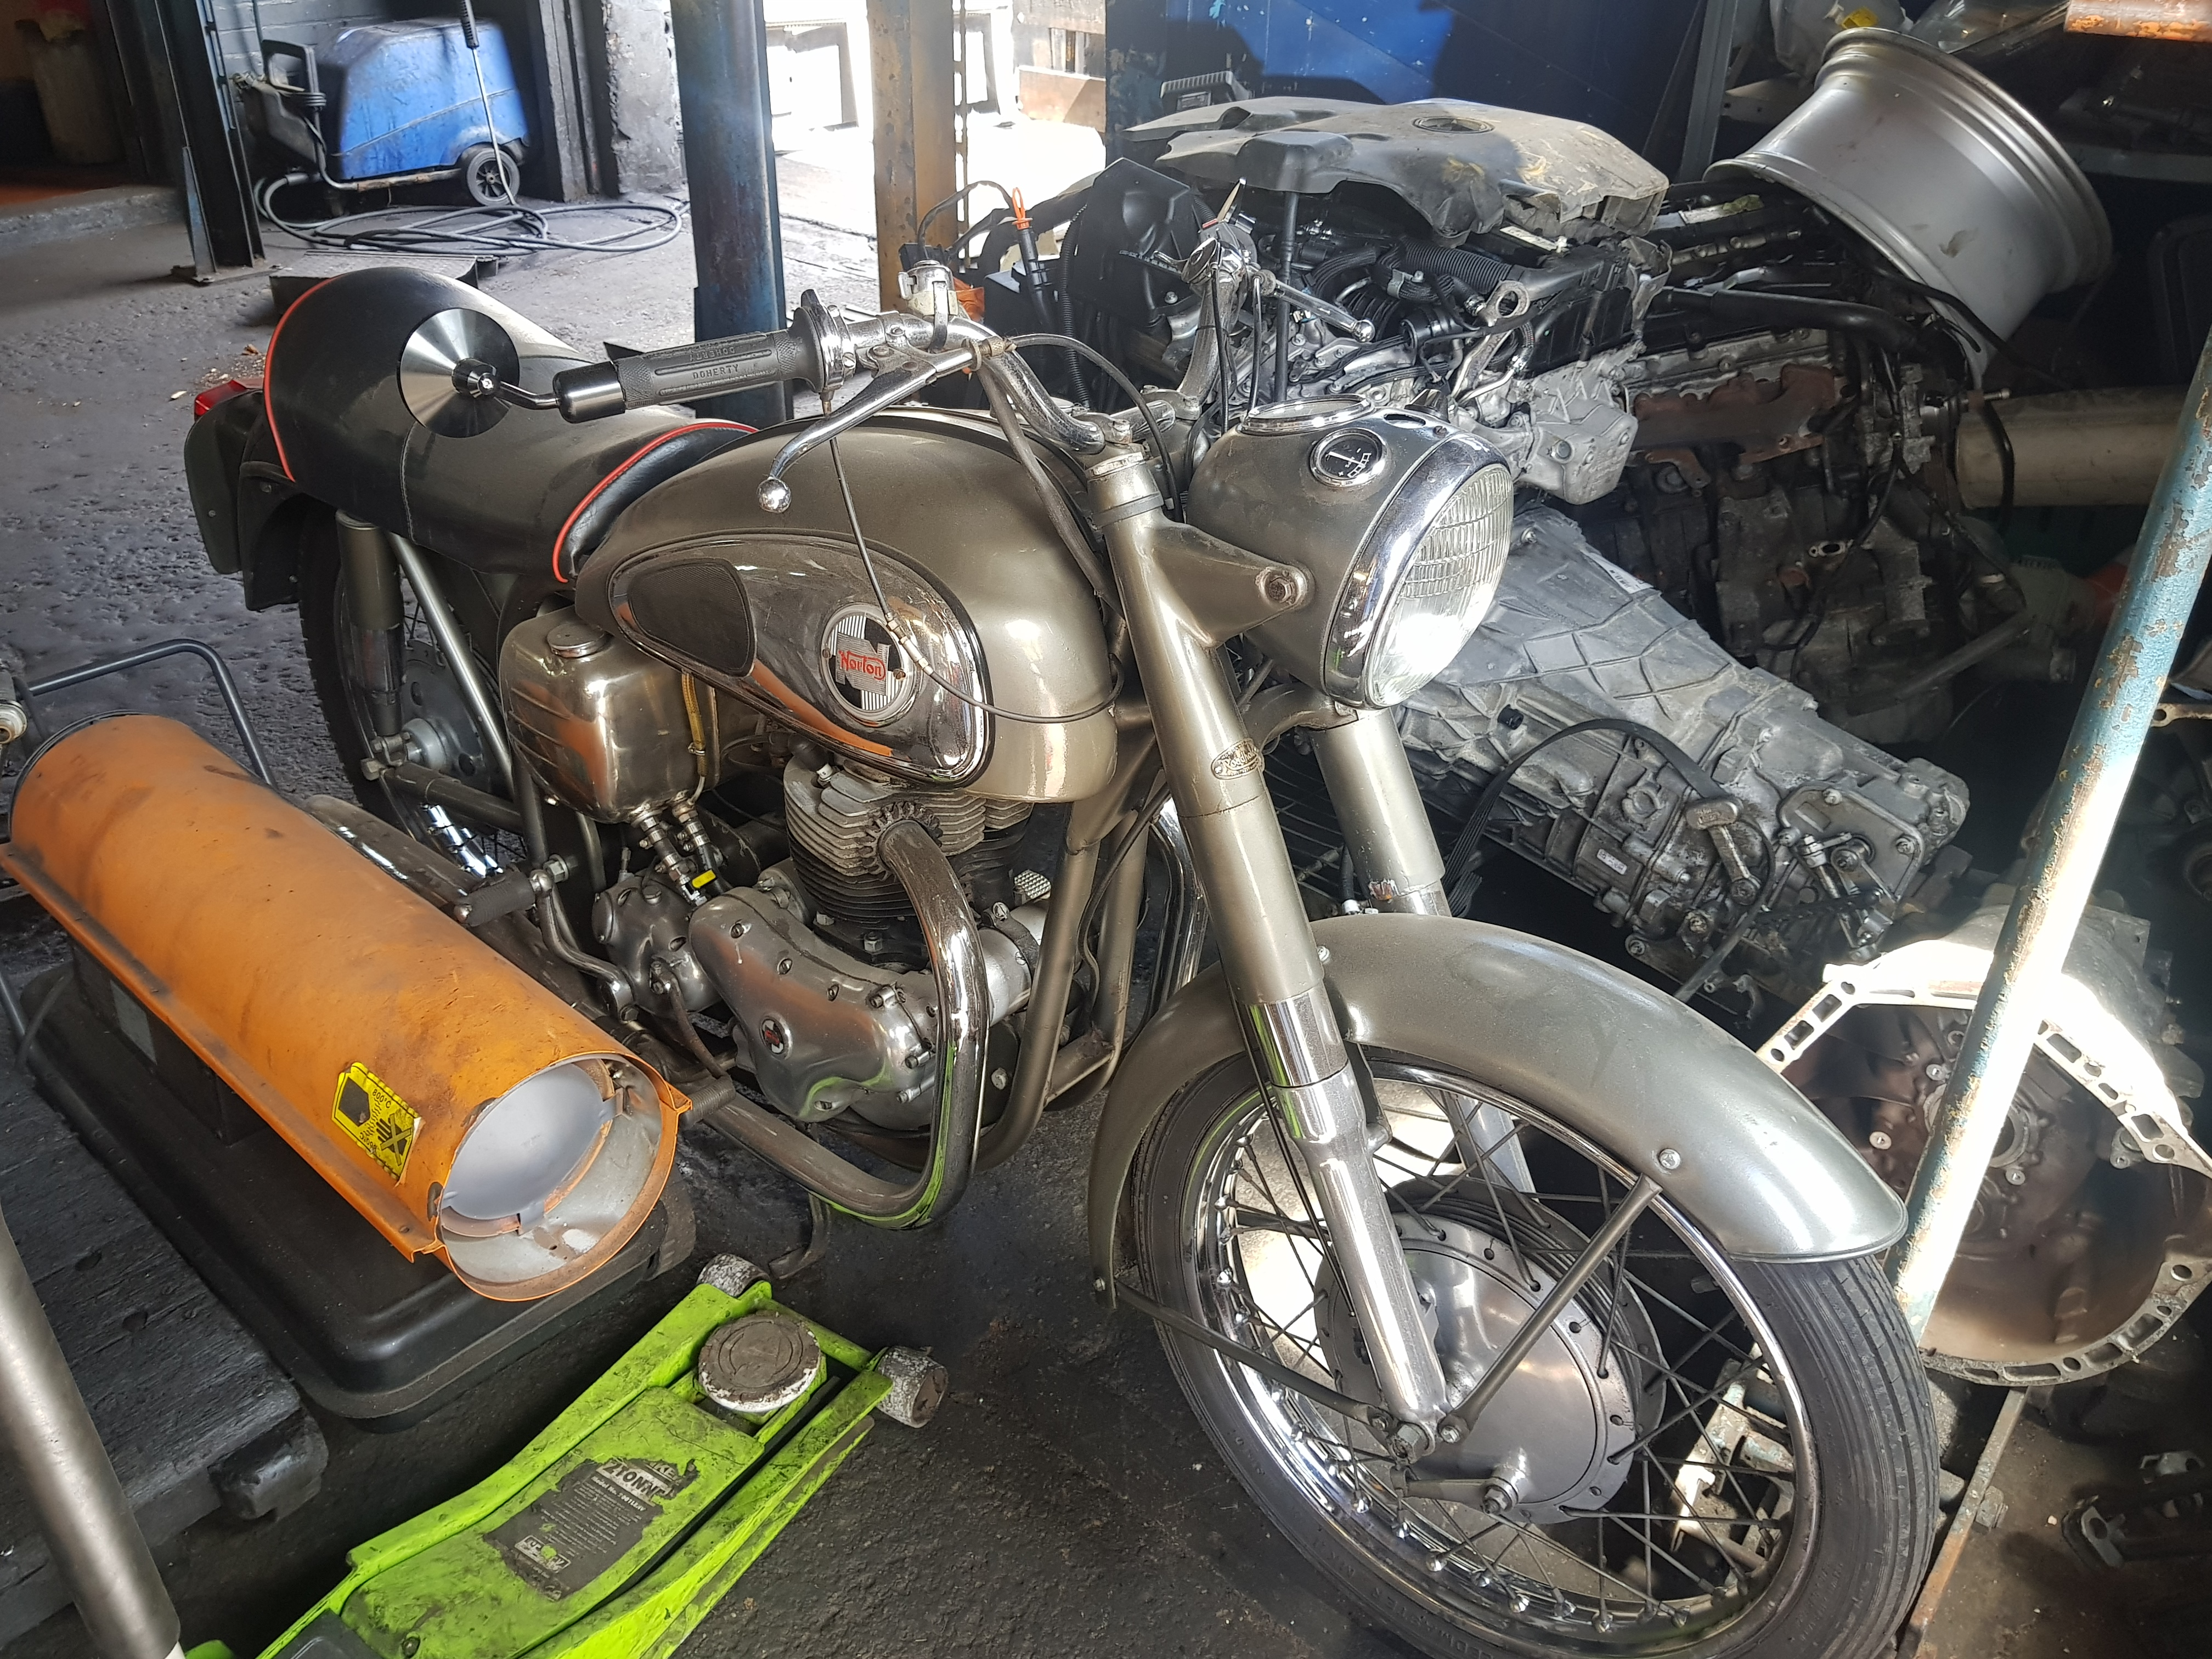 Motorbike restoration in progress...